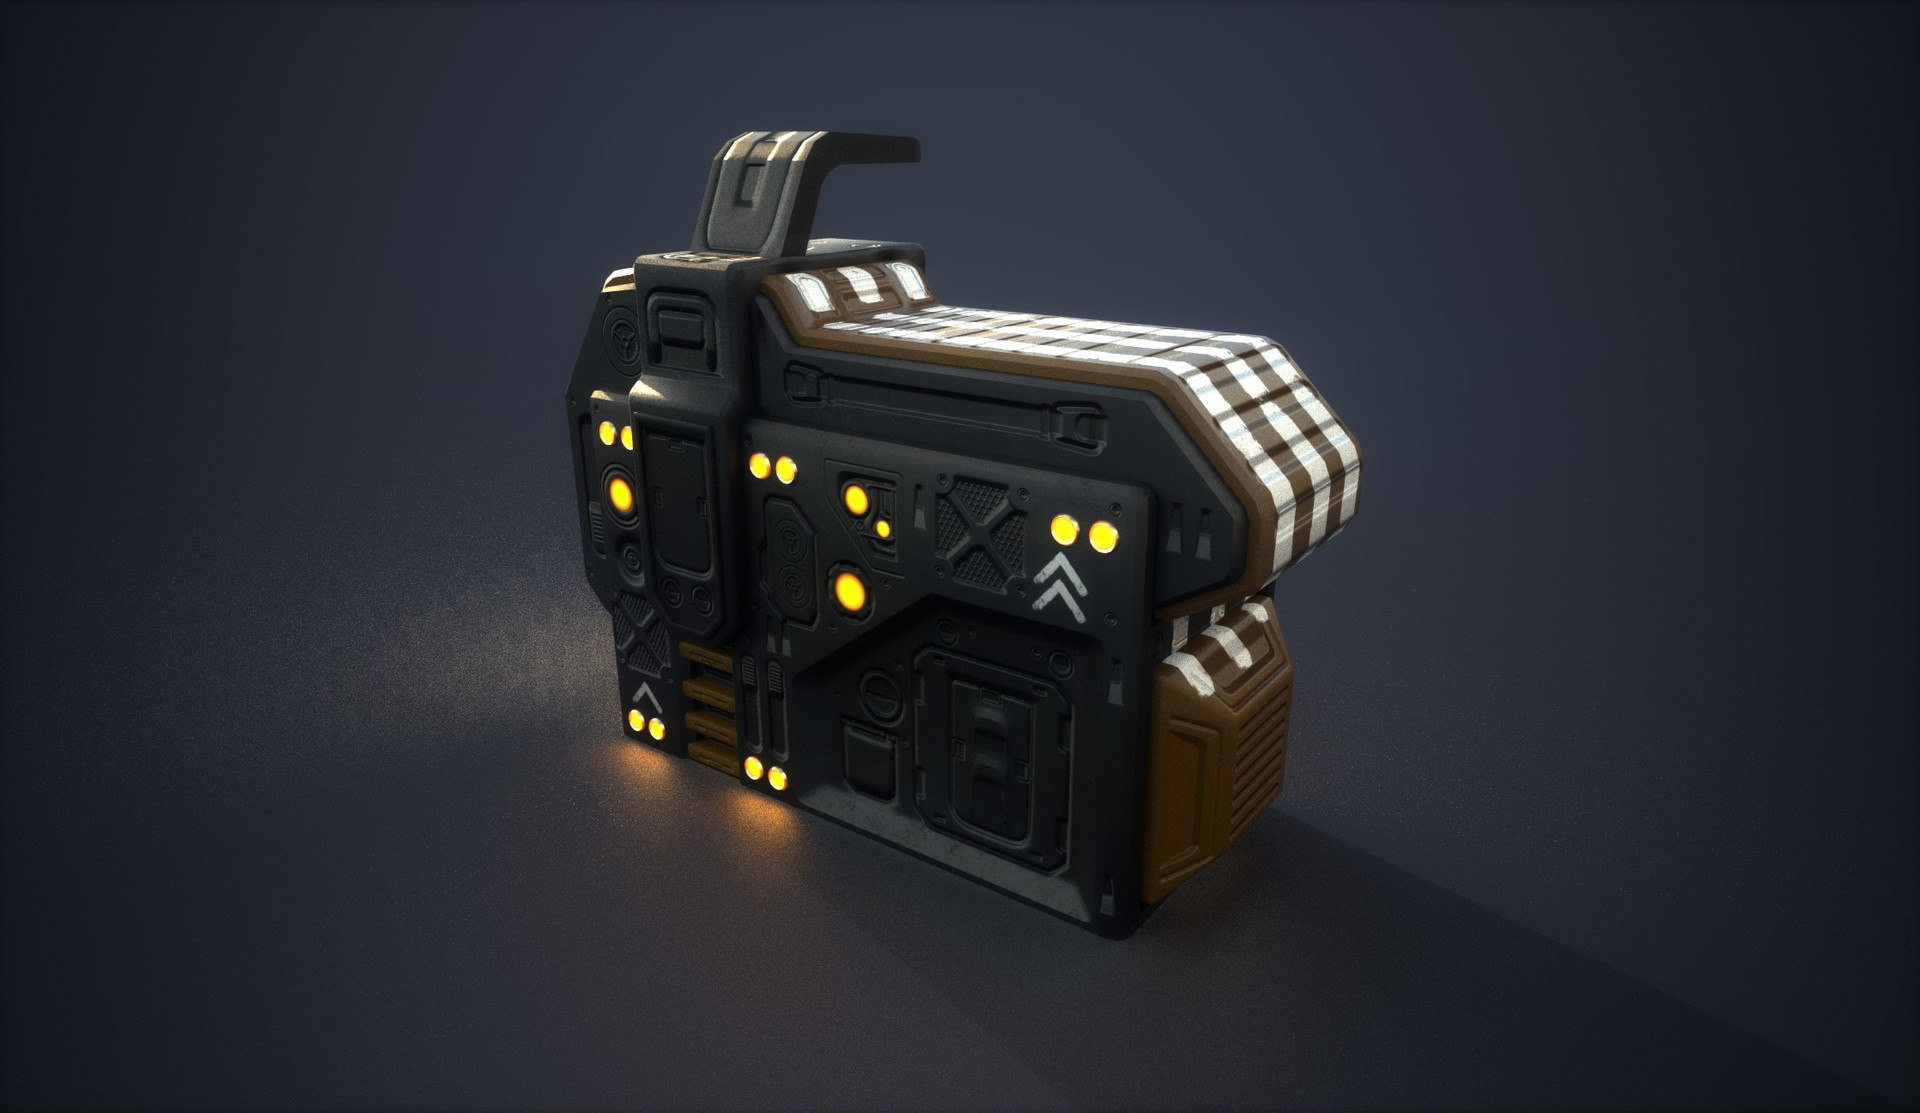 Jordan spinks ammo box small